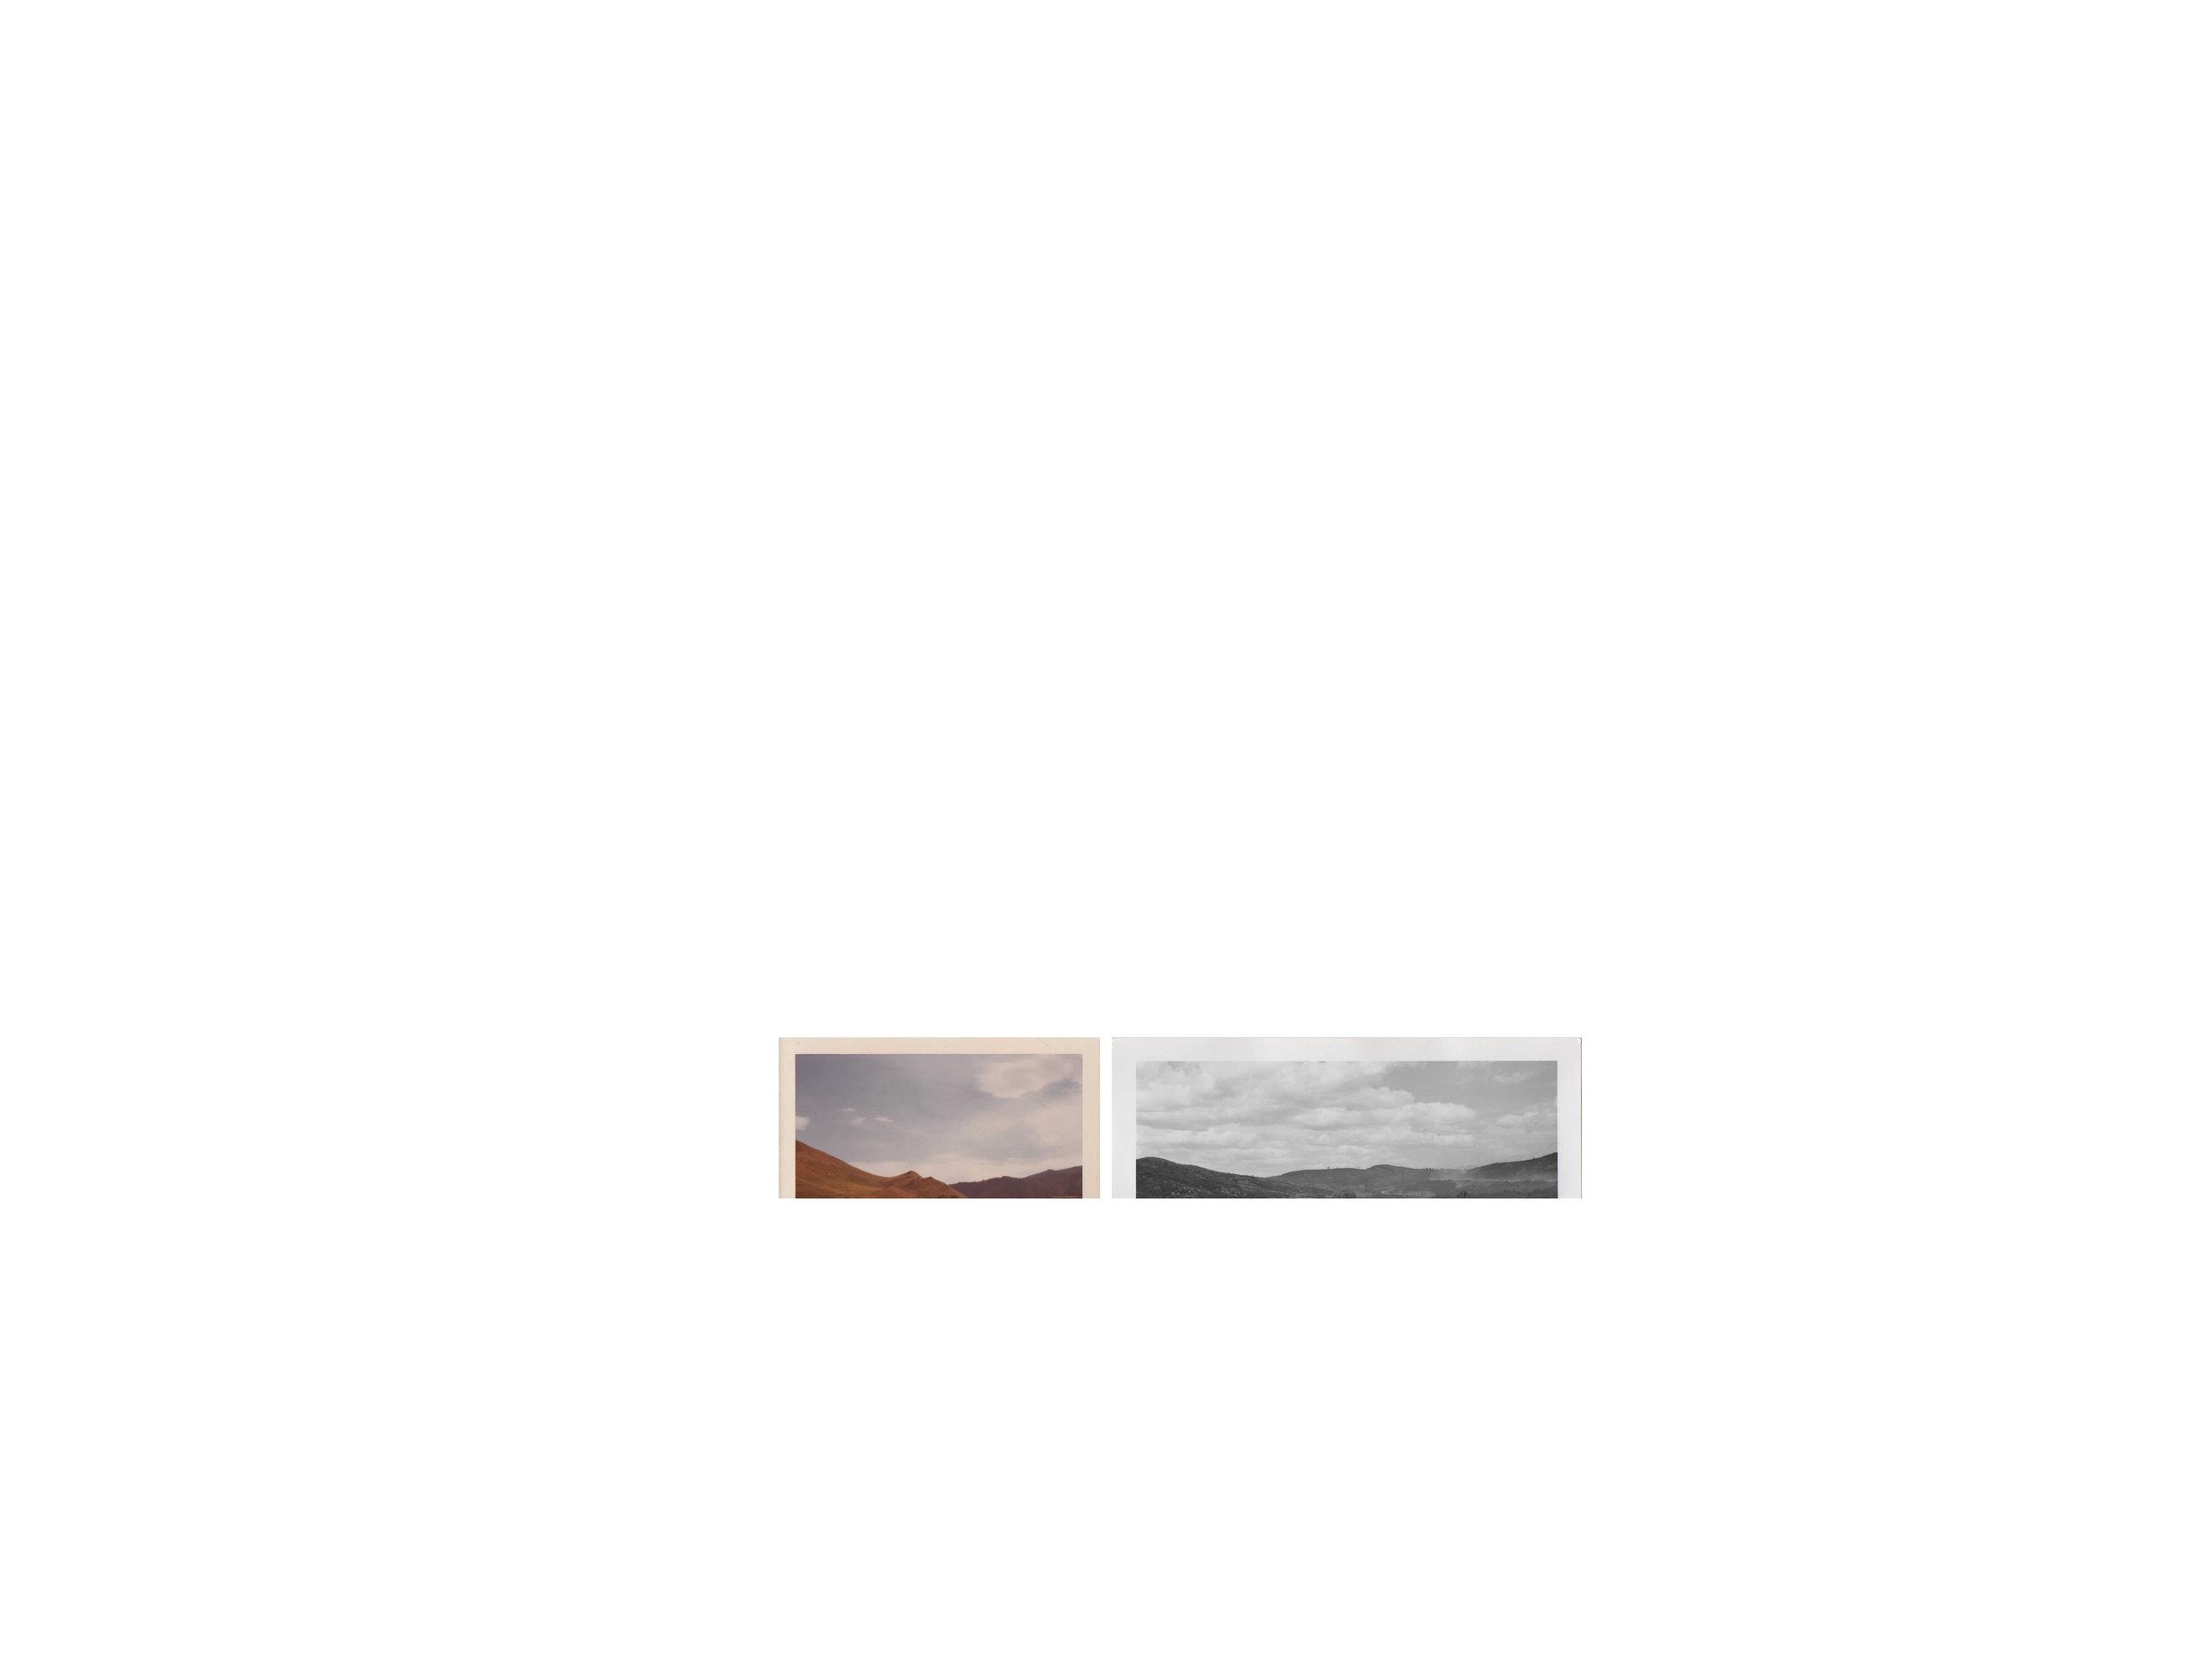 Westward Yearning No. 18  18 x 24 inches | 2018